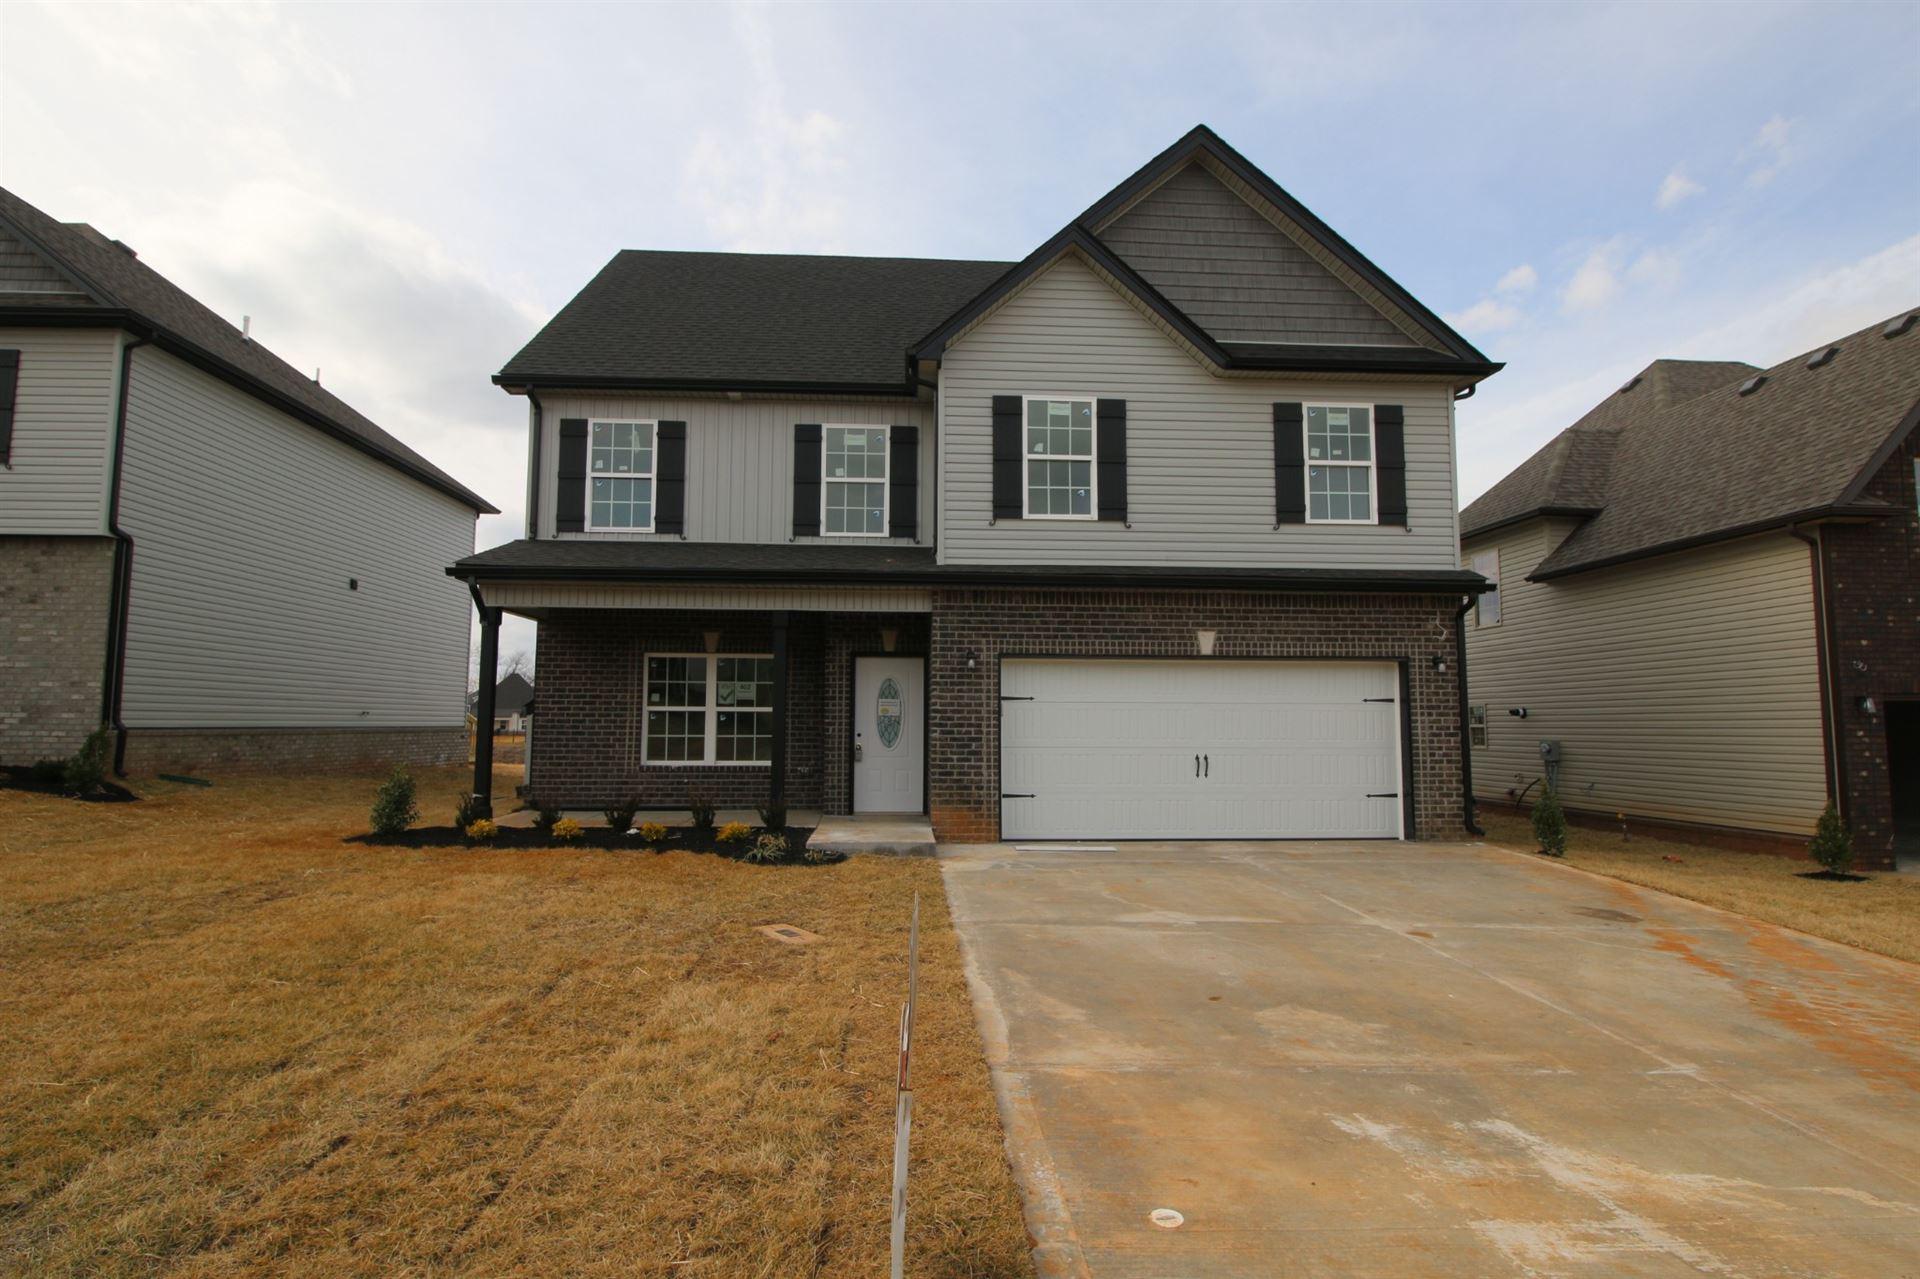 402 Summerfield, Clarksville, TN 37040 - MLS#: 2298457